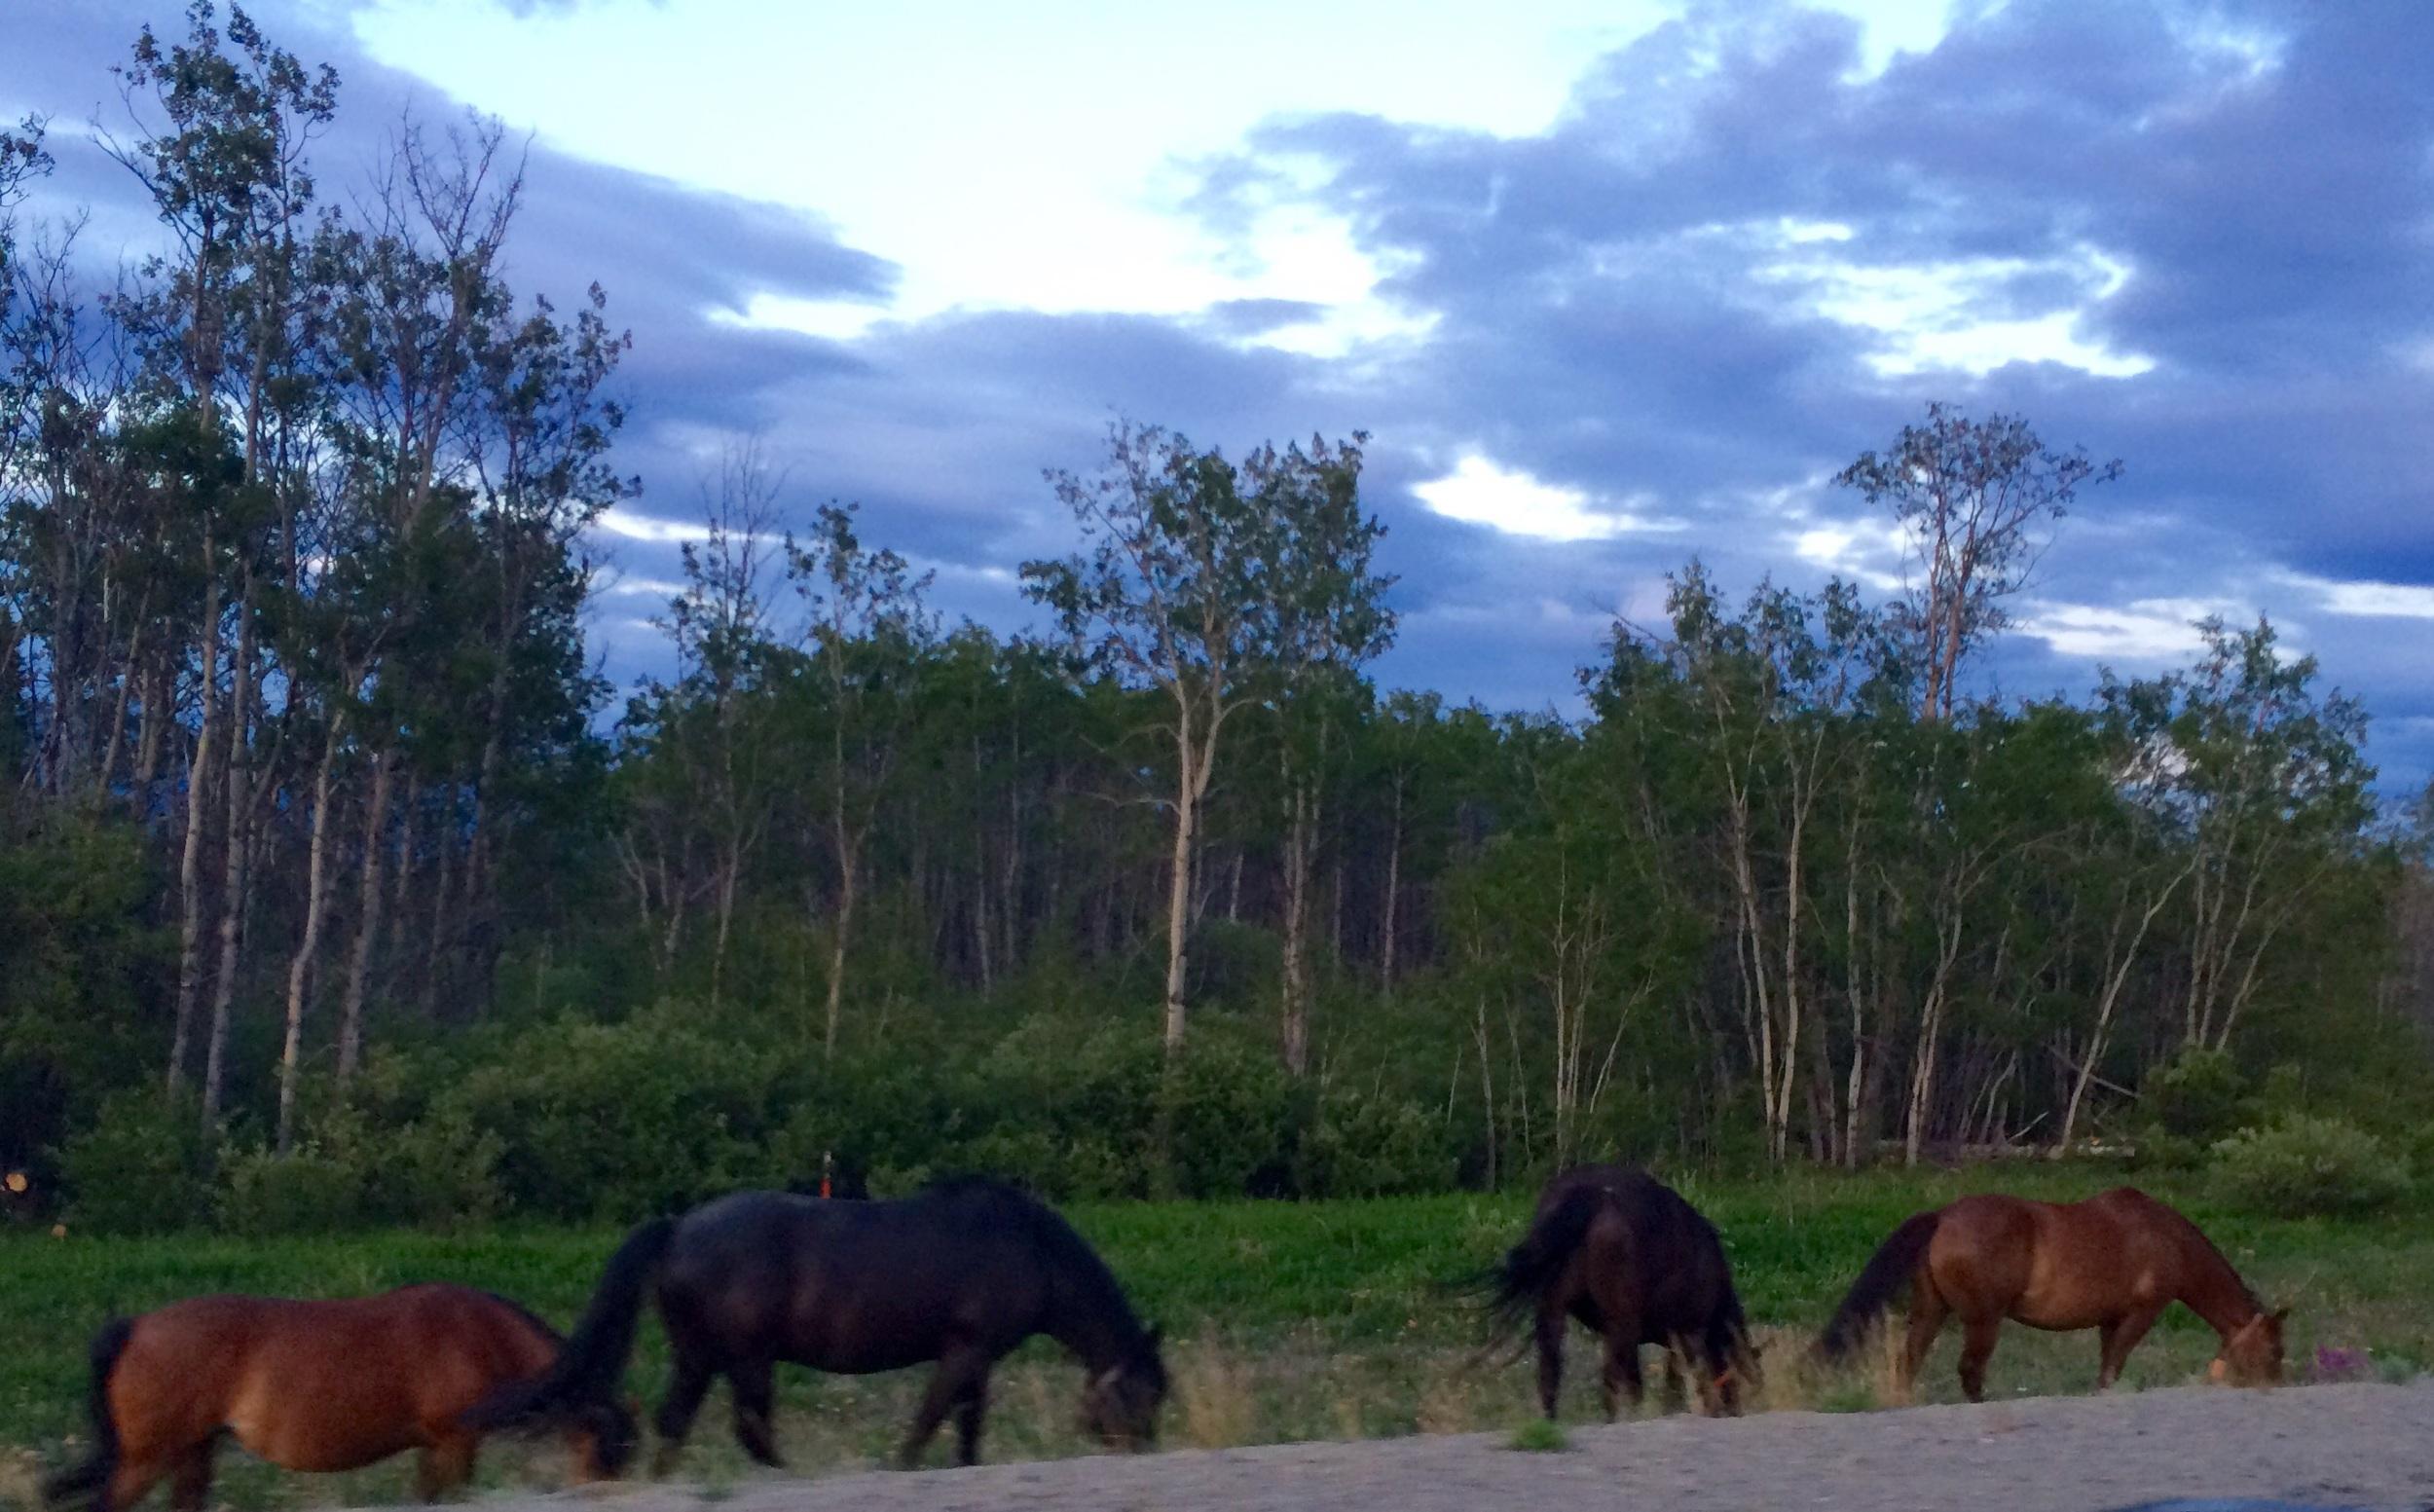 Yukon ponies